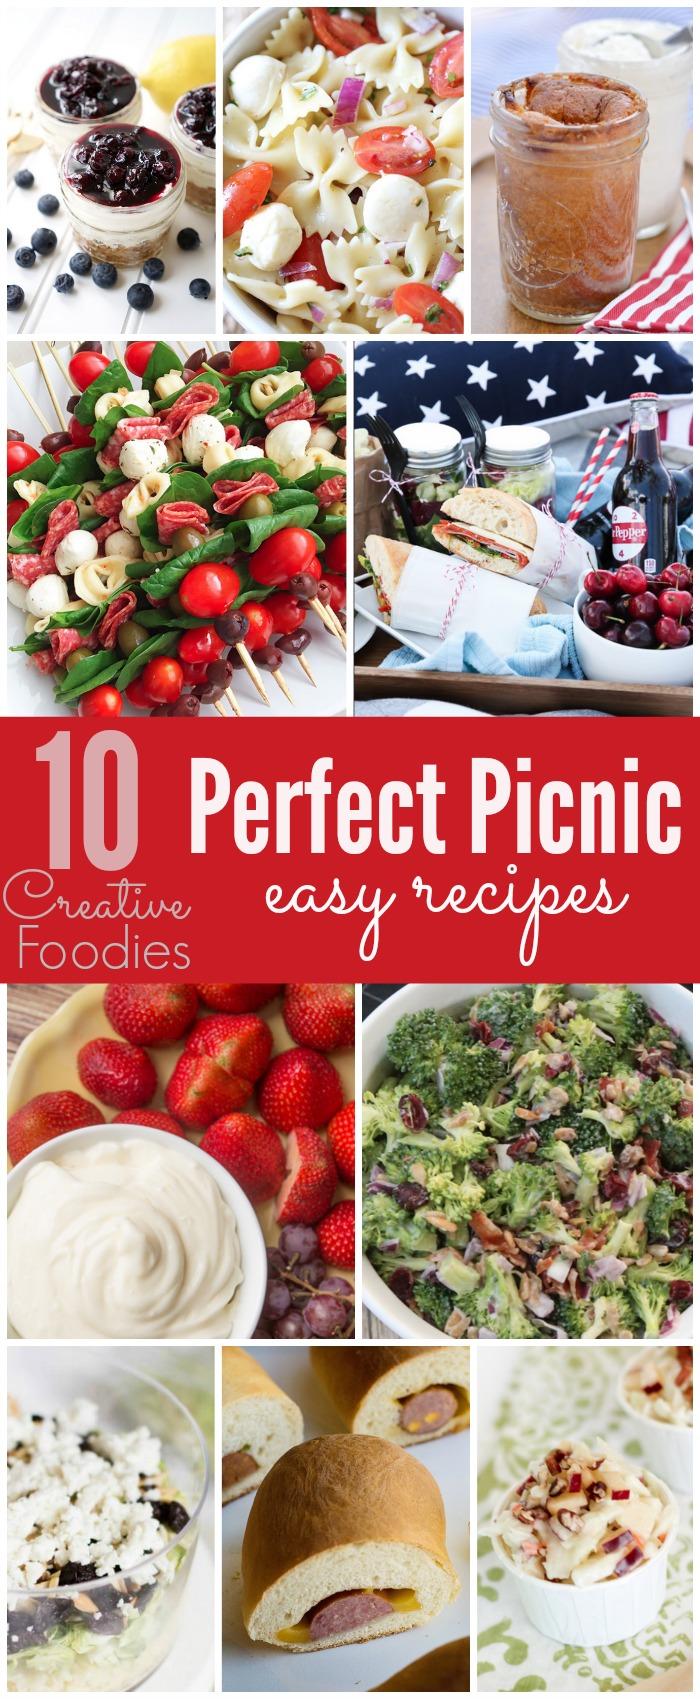 10 Easy Picnic Recipes